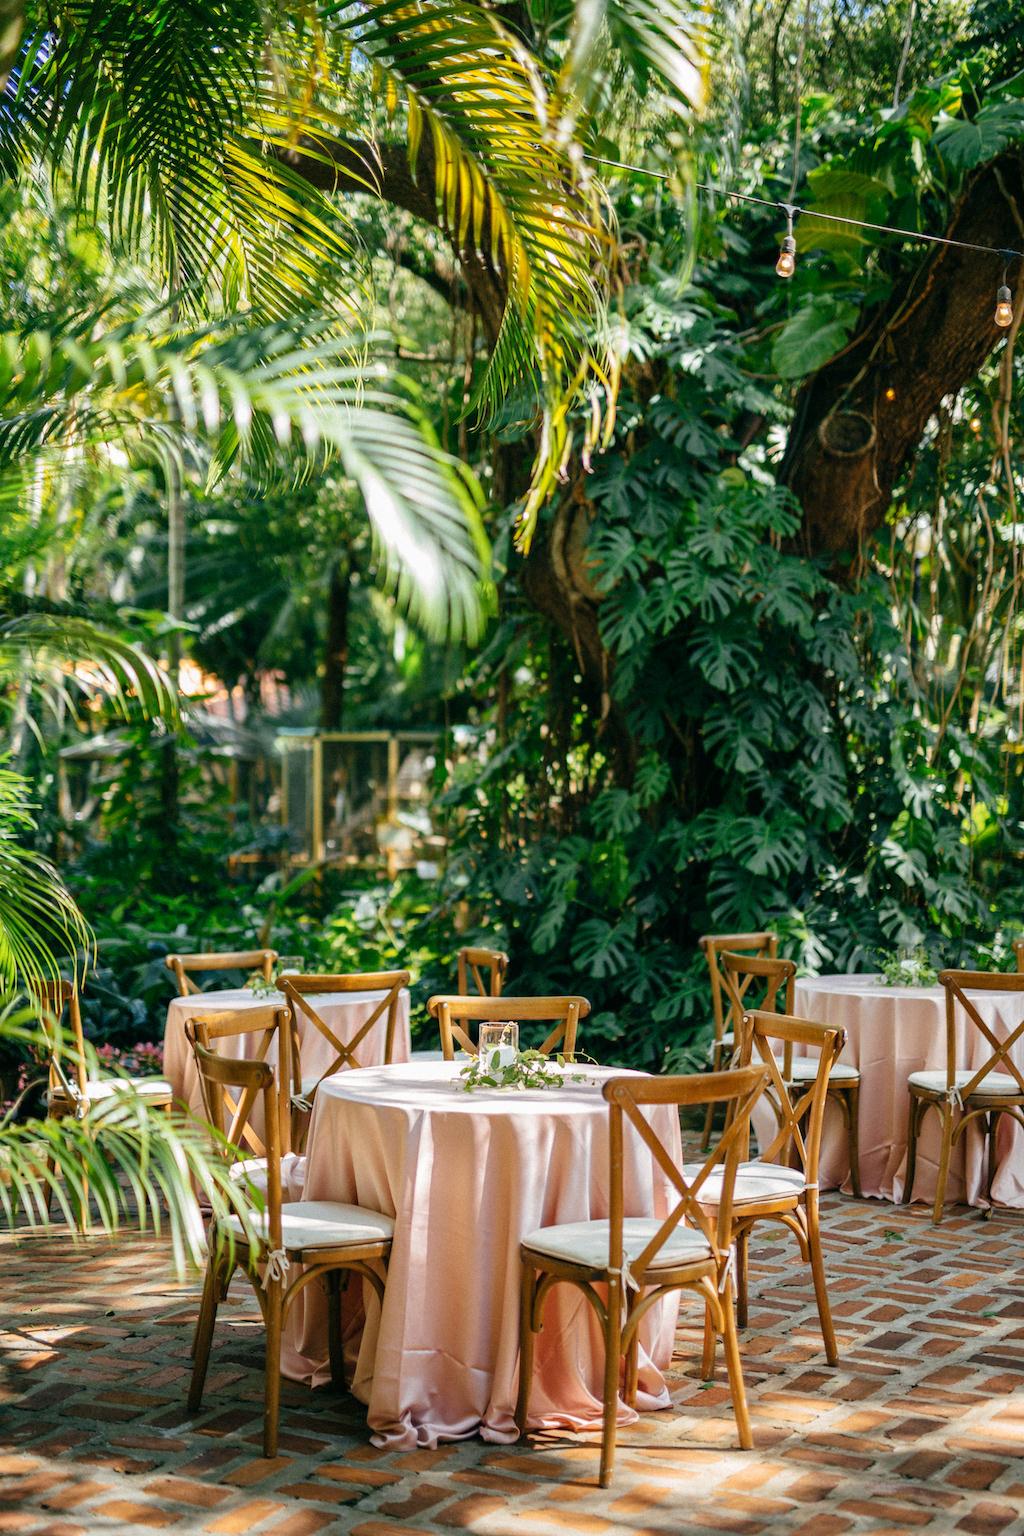 Elegant Classic Simple Garden Wedding Reception Decor, Round Tables with Pink Linens, Wooden Crossback Chairs | Tampa Bay Outdoor Wedding Venue Sunken Gardens